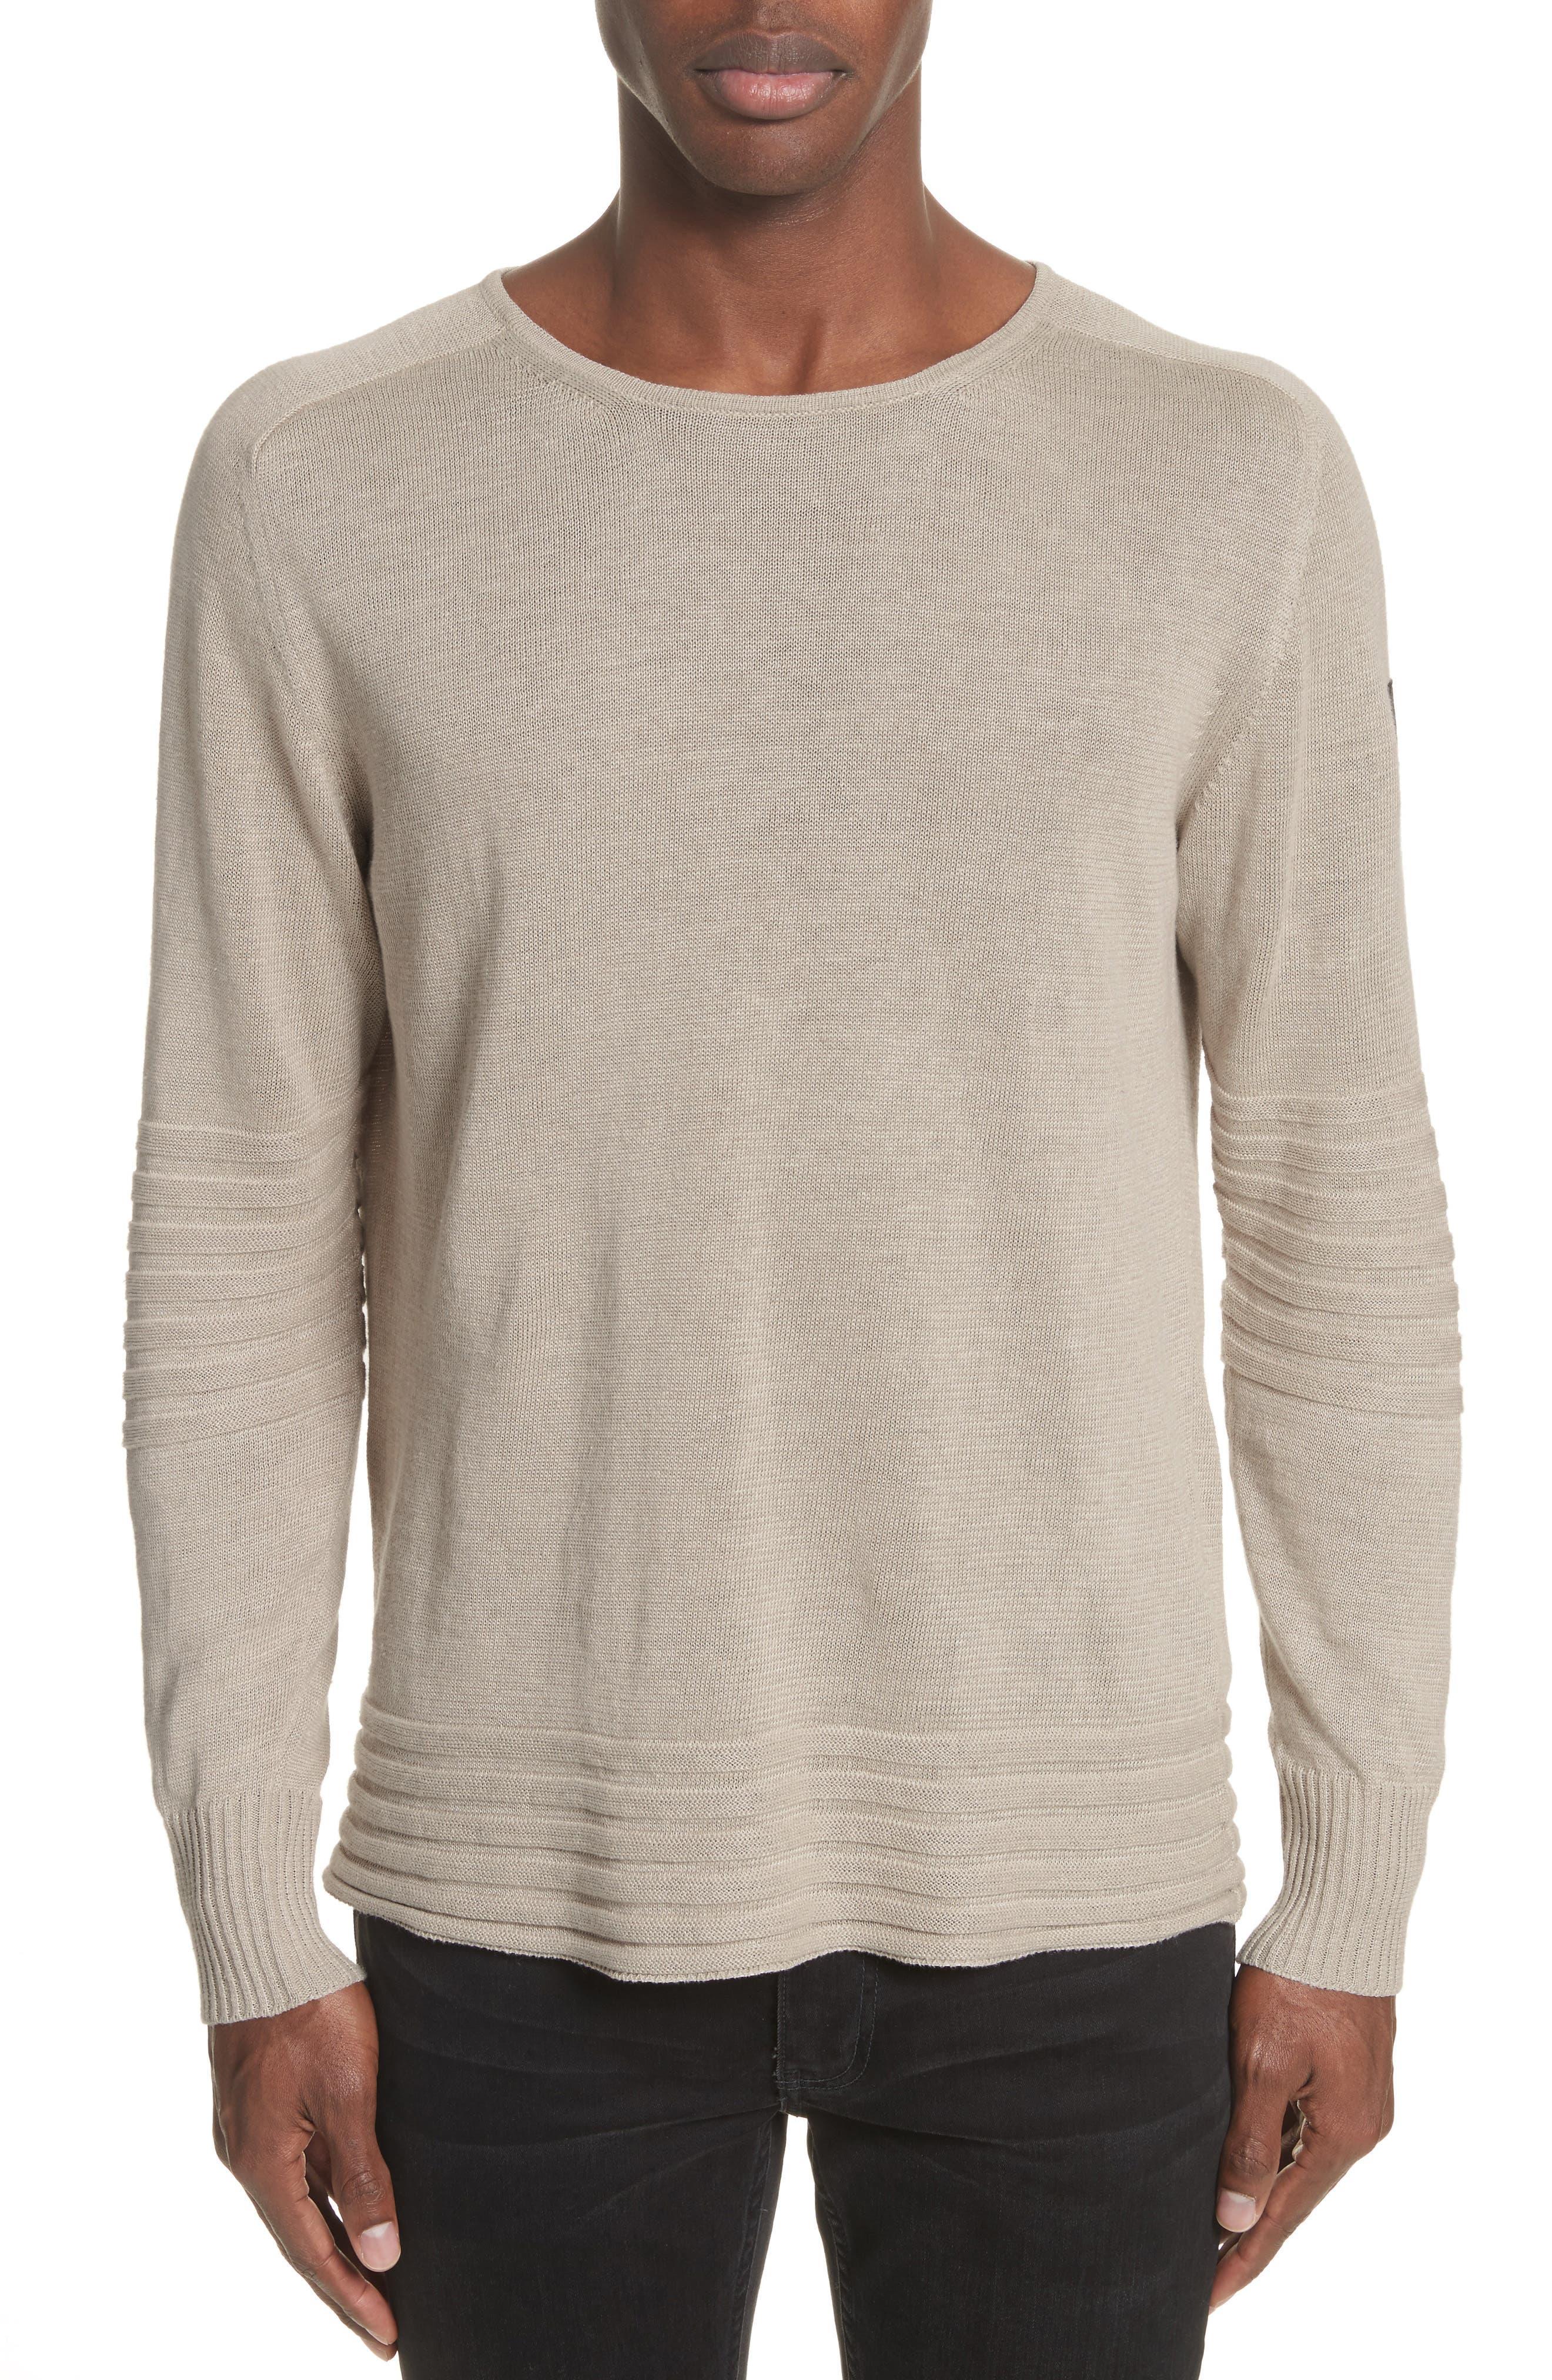 Exford Linen Crewneck Sweater,                             Alternate thumbnail 7, color,